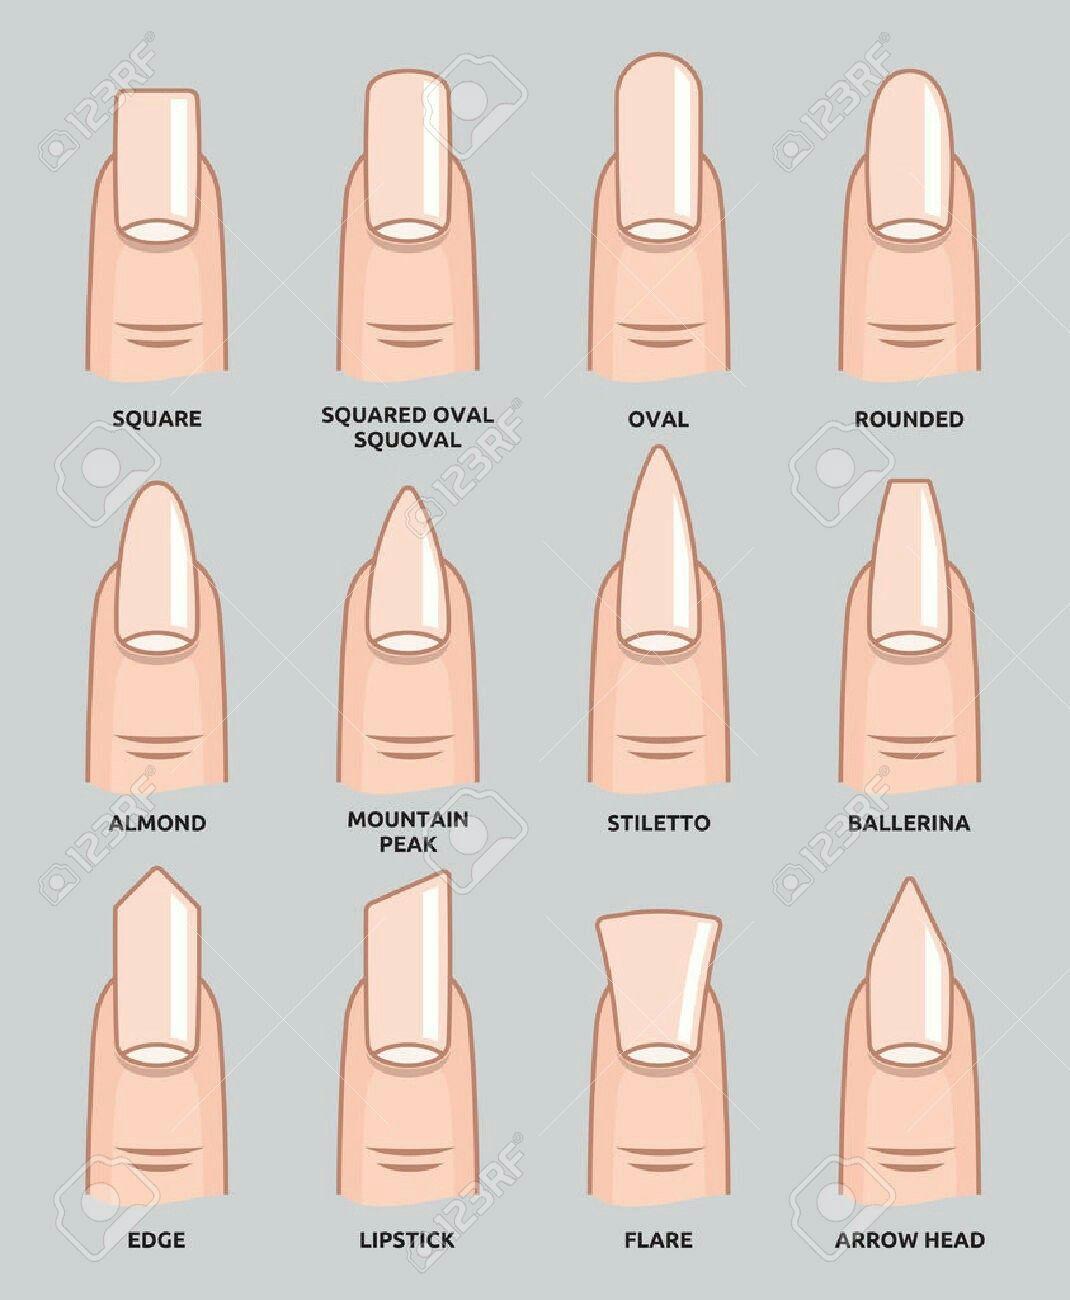 Nailshapes | Nail Style | Pinterest | Girls, Acrylics and Makeup